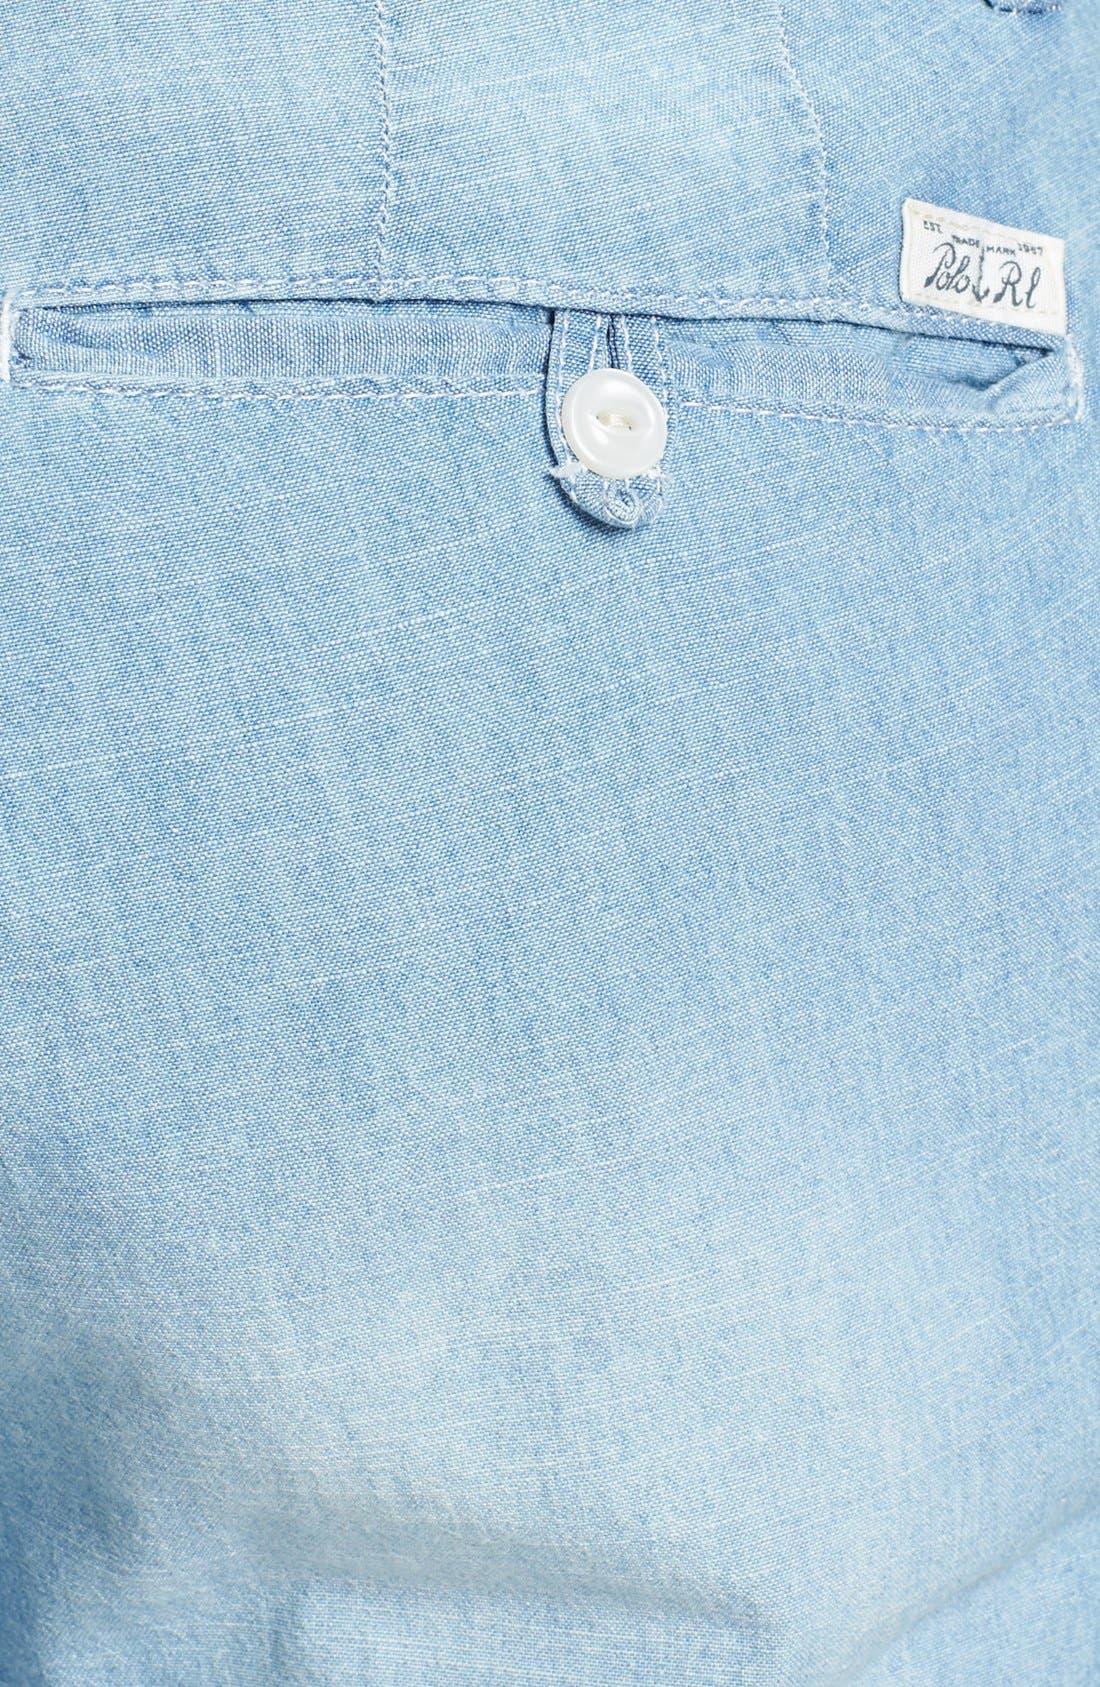 Alternate Image 3  - Polo Ralph Lauren 'Greenwich' Shorts